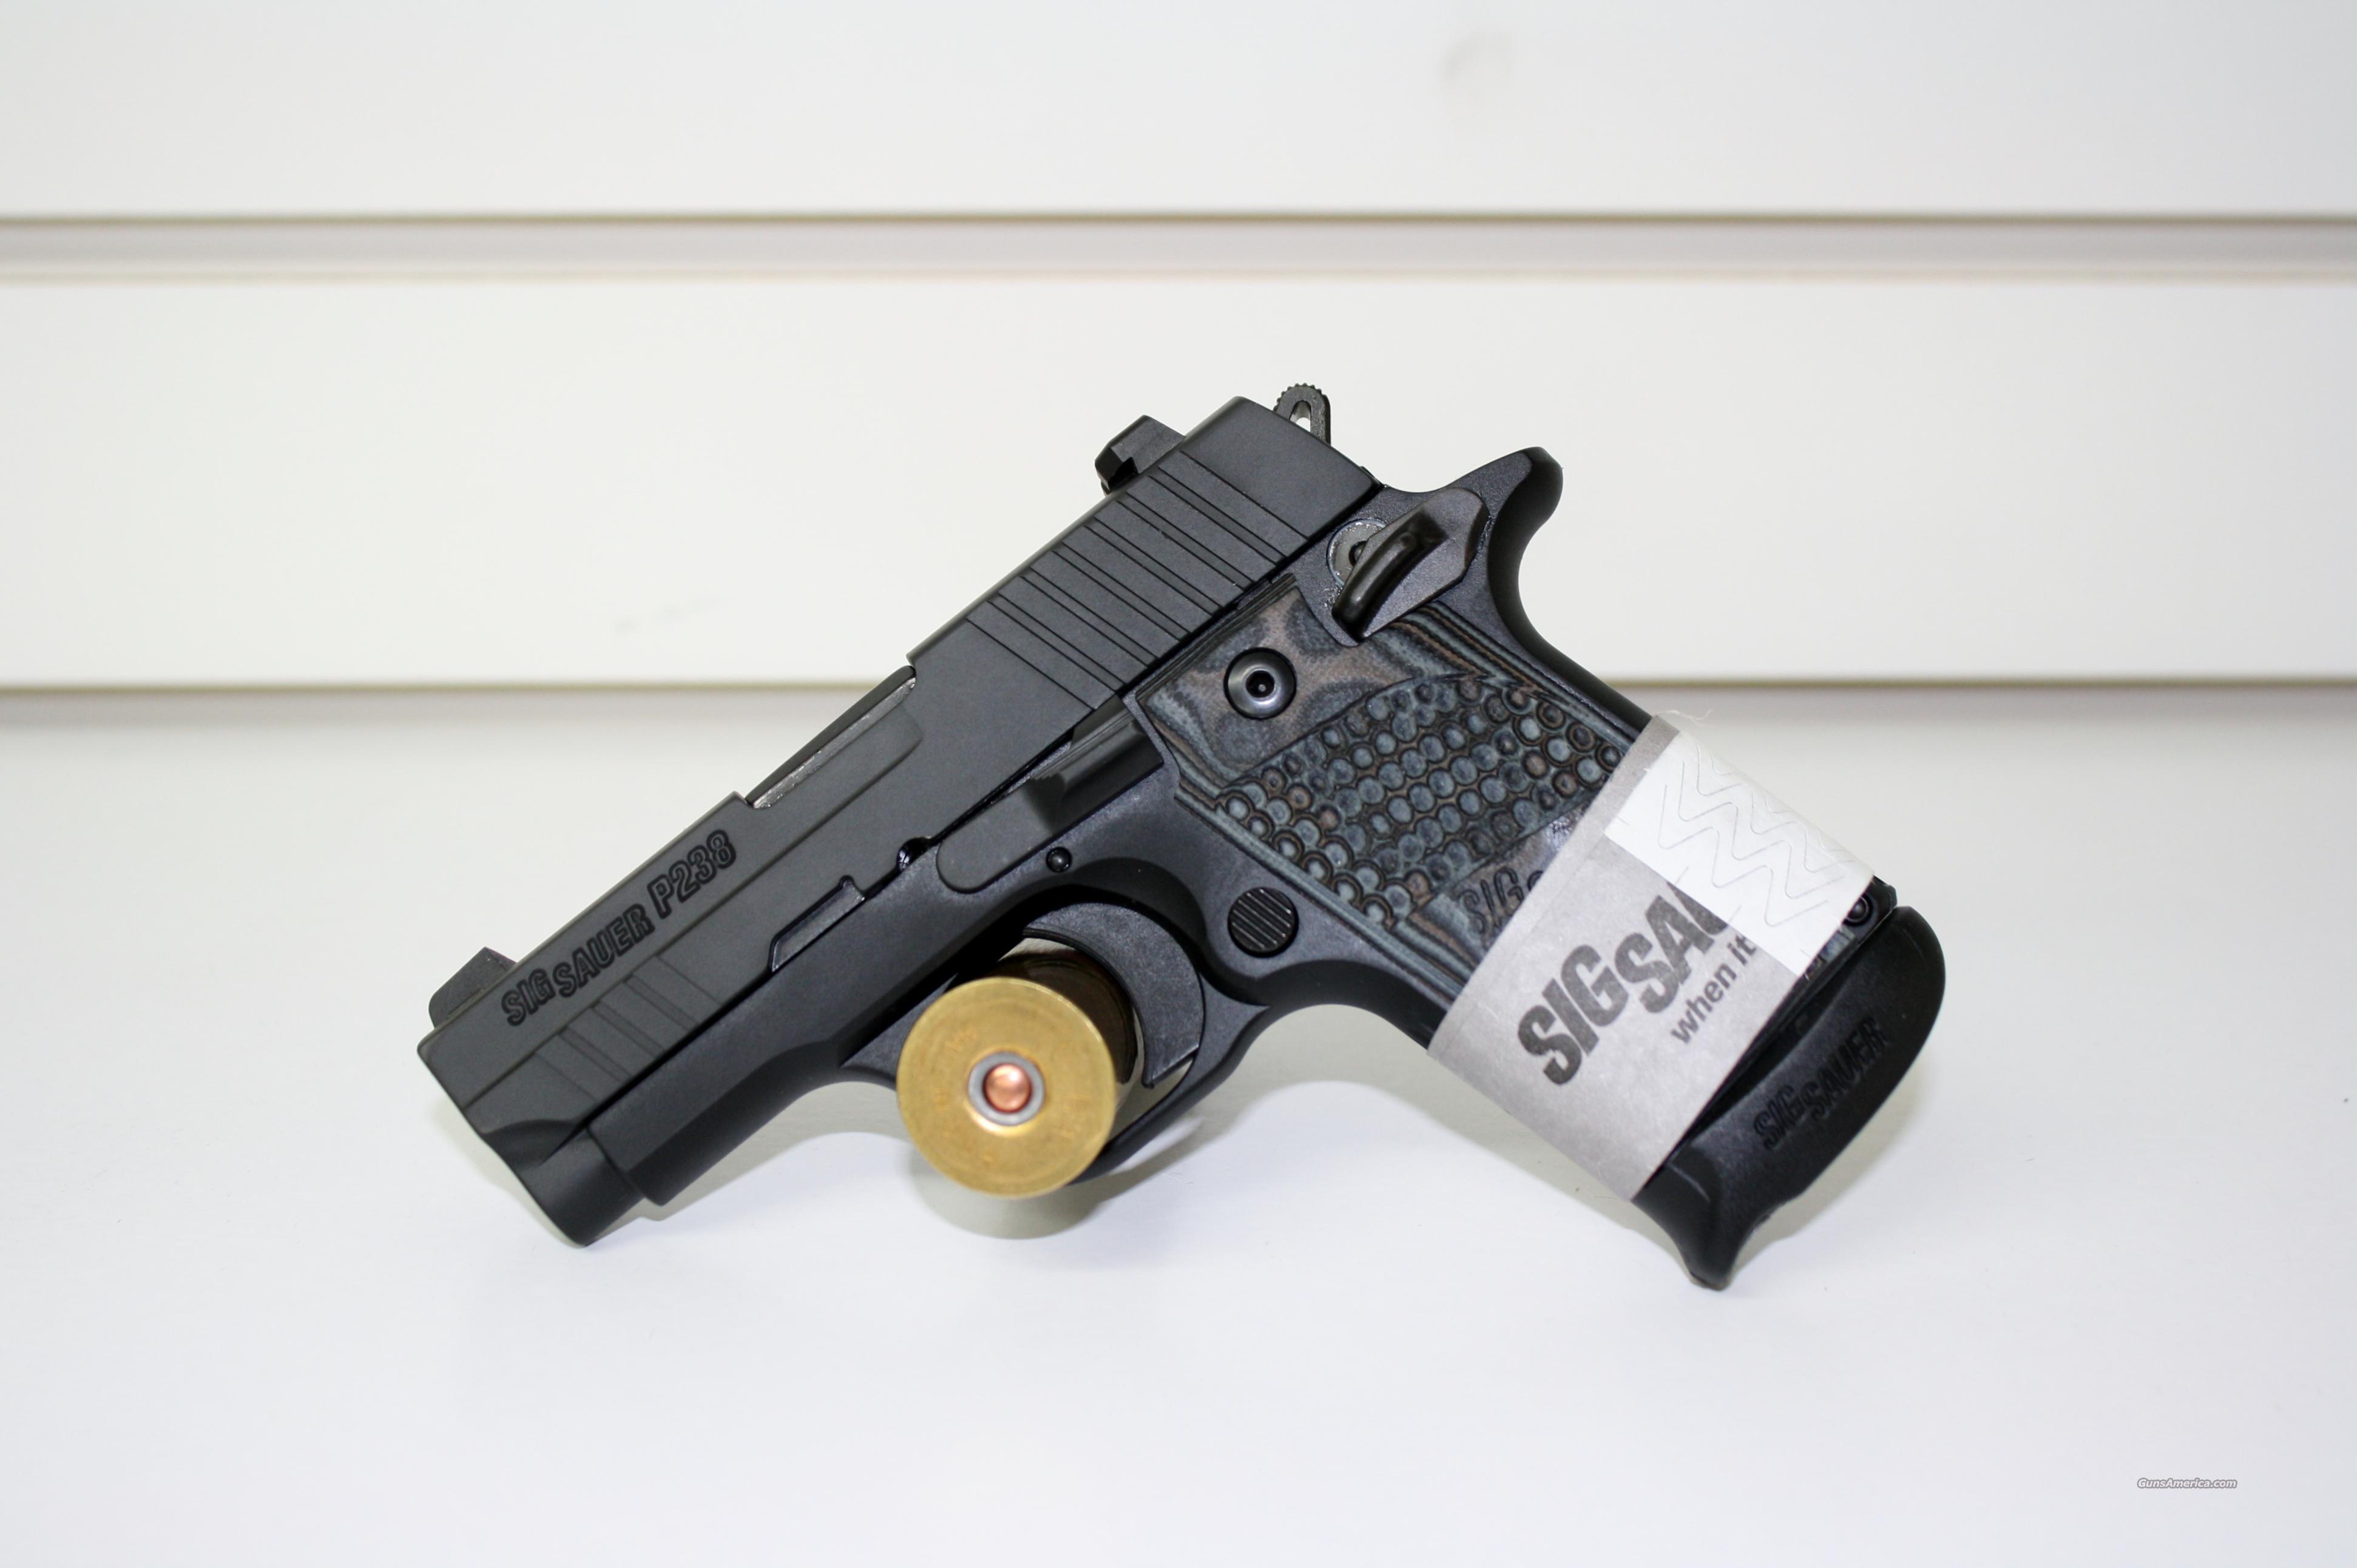 SIG SAUER P238 EXTREME 380  Guns > Pistols > Sig - Sauer/Sigarms Pistols > P238